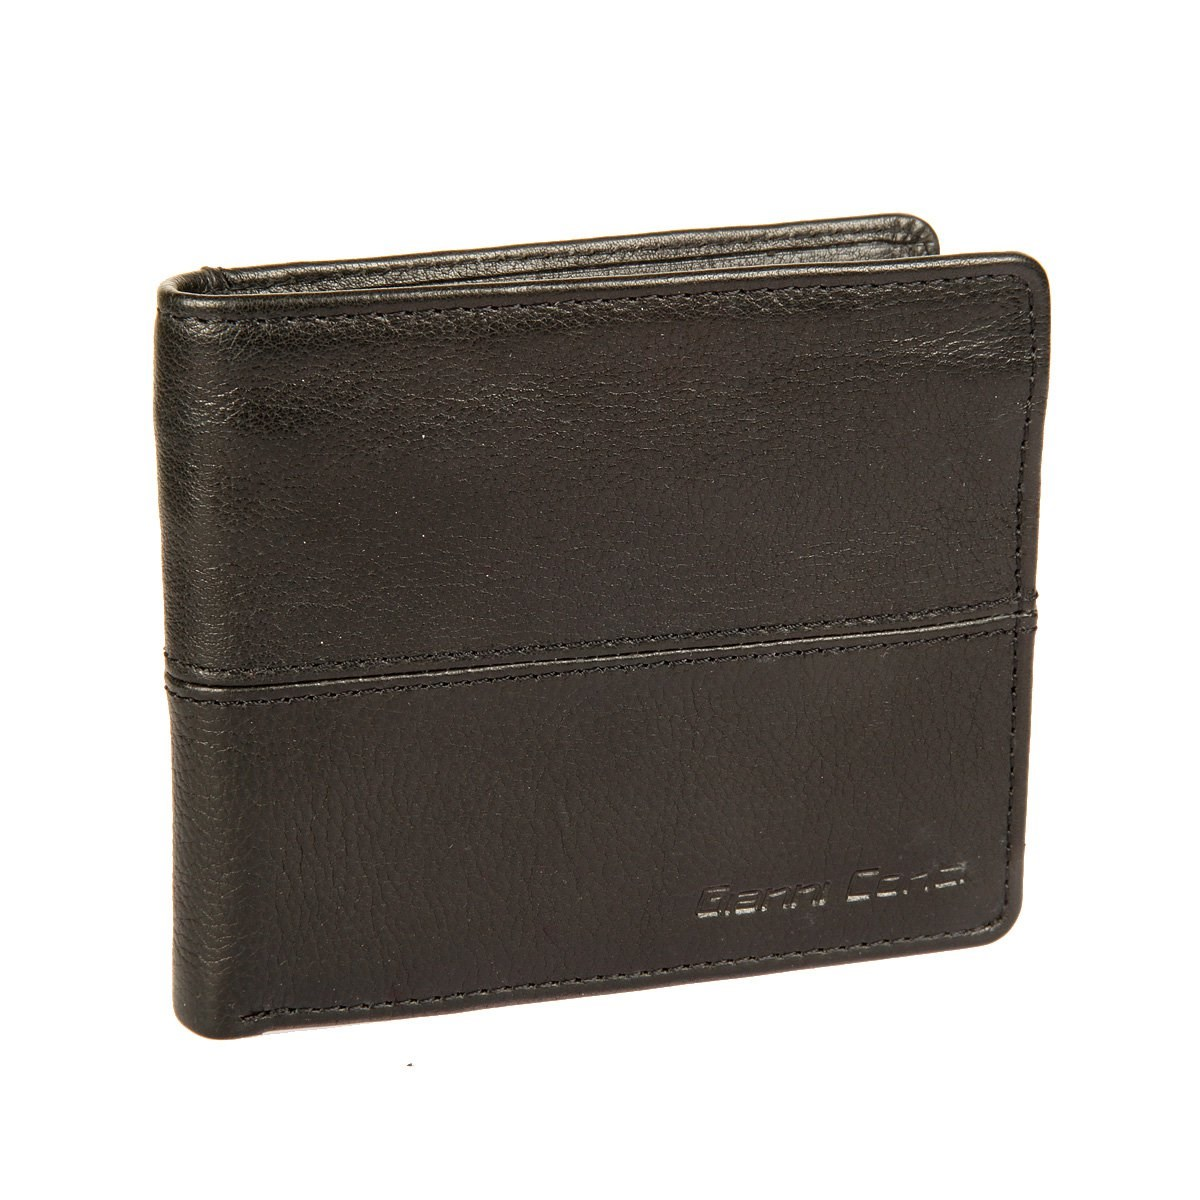 Coin Purse Gianni Conti 1137460E black 2017 hottest women short design gradient color coin purse cute ladies wallet bags pu leather handbags card holder clutch purse